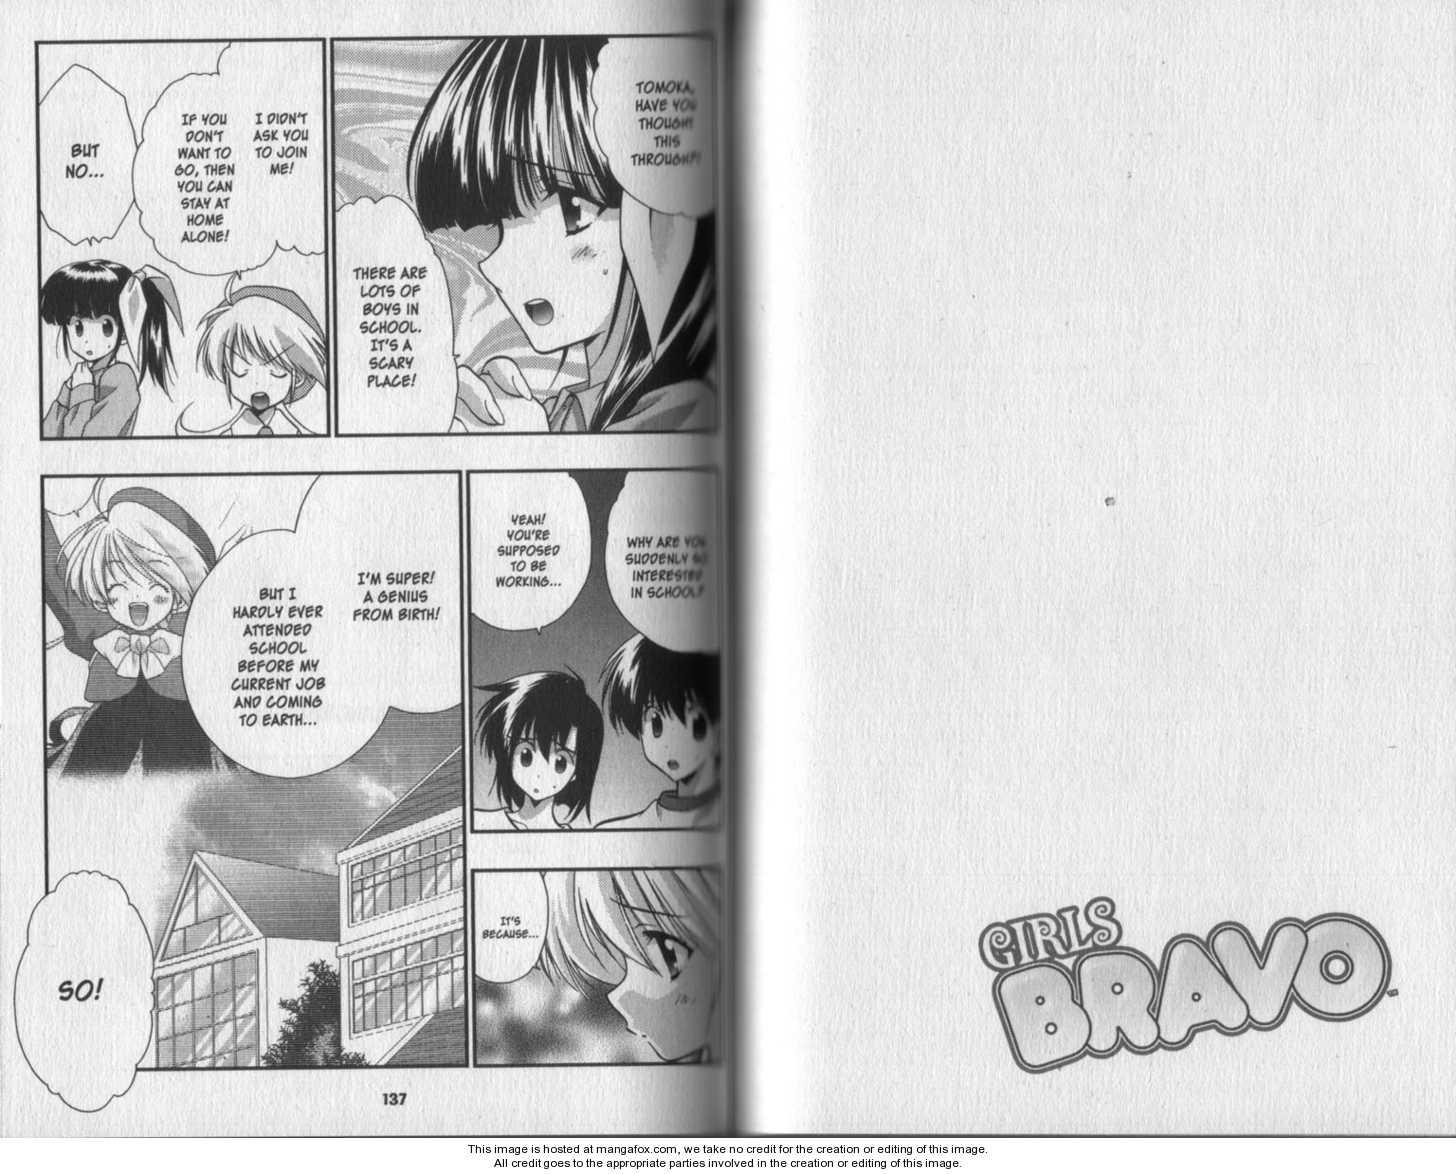 Girls Bravo 53 Page 3